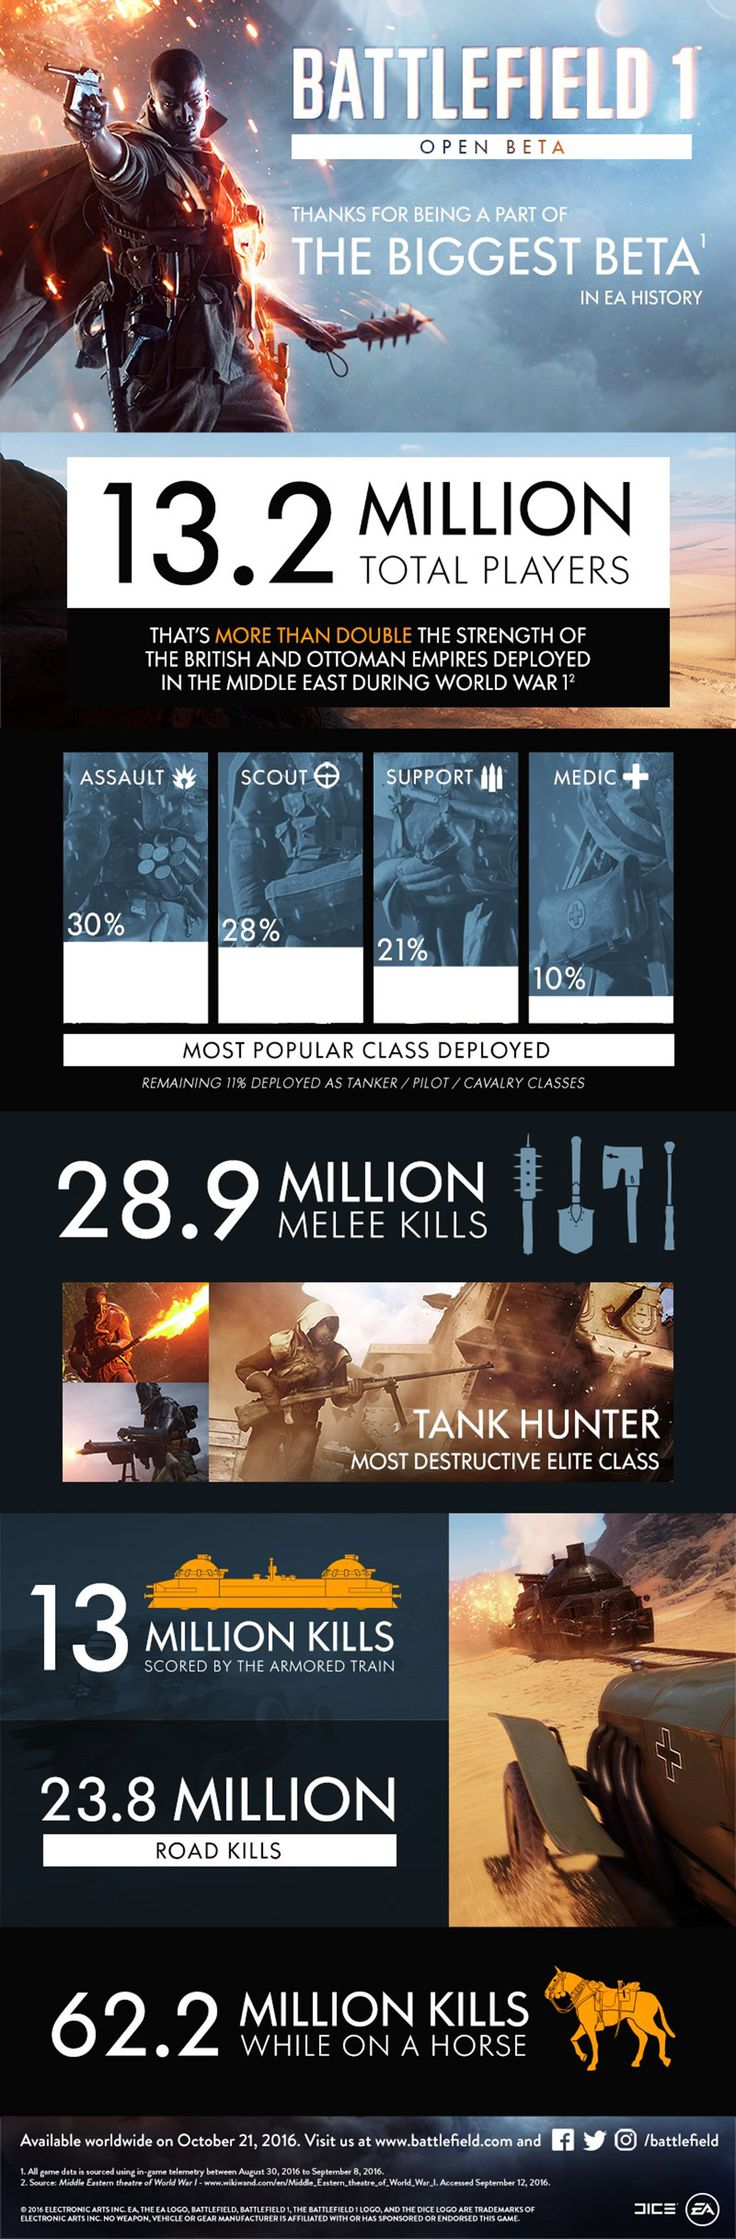 Battlefield 1 Open Beta - Video Game Infographic. Topic: fps, war, shooter